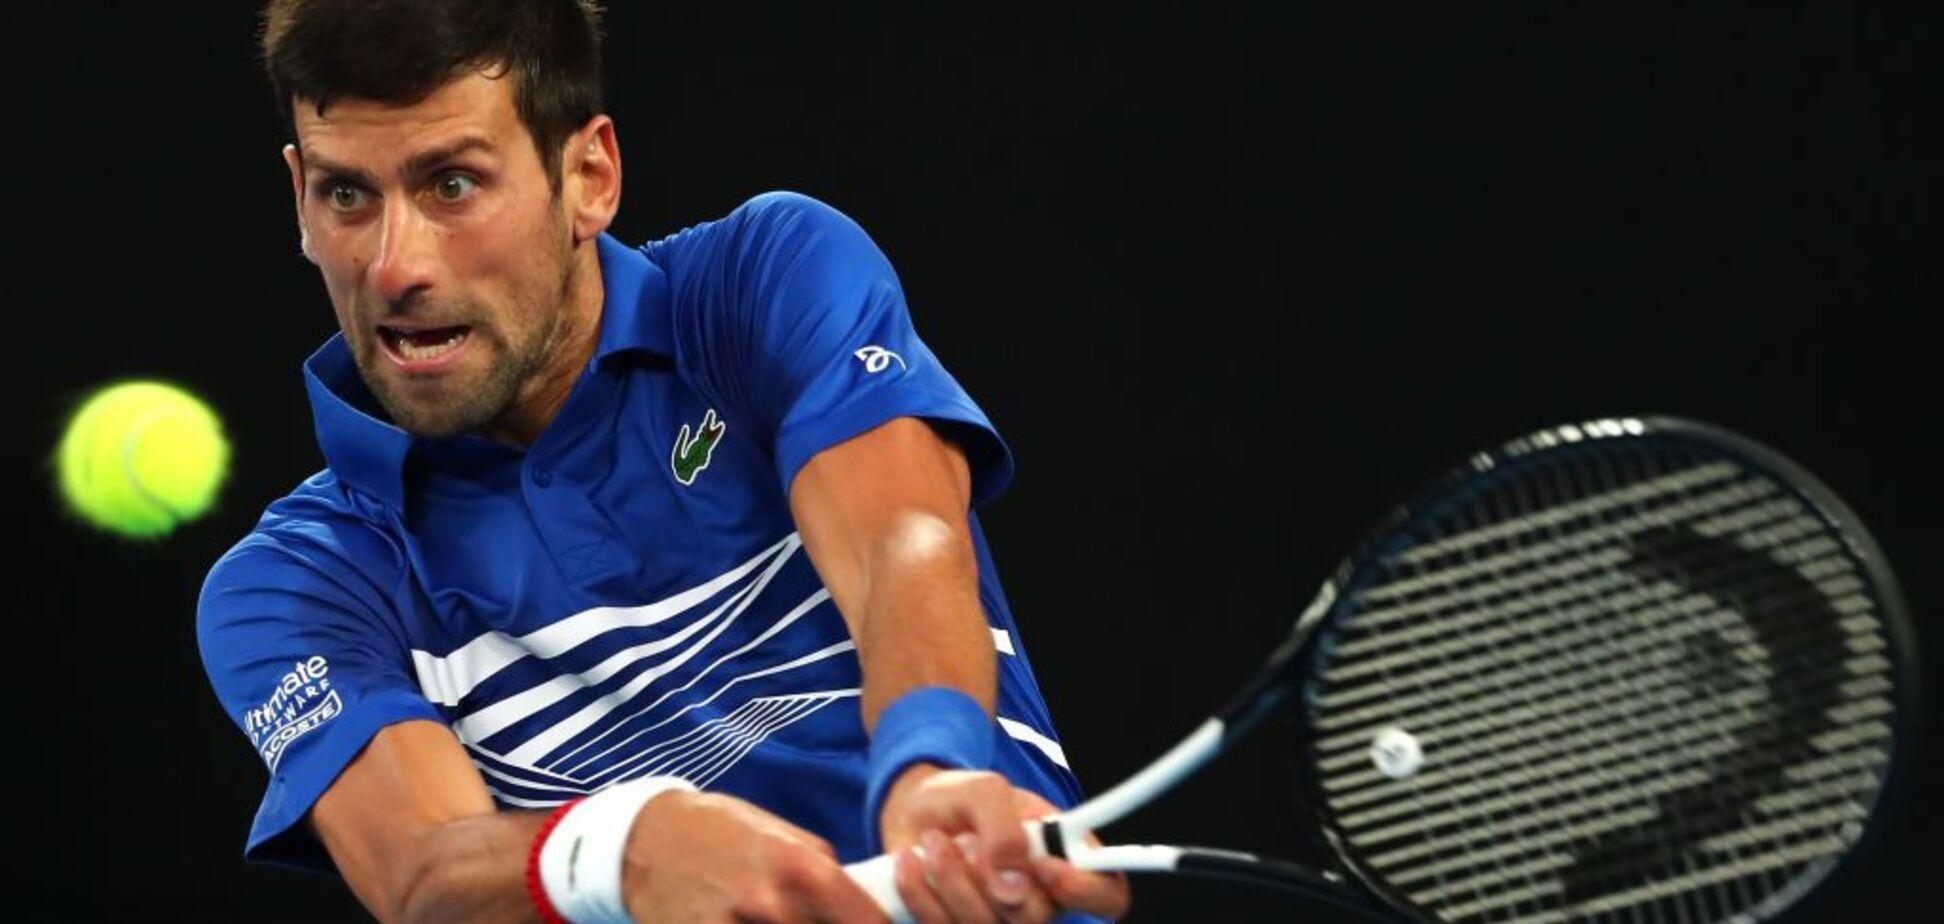 Финал Australian Open завершился историческим рекордом